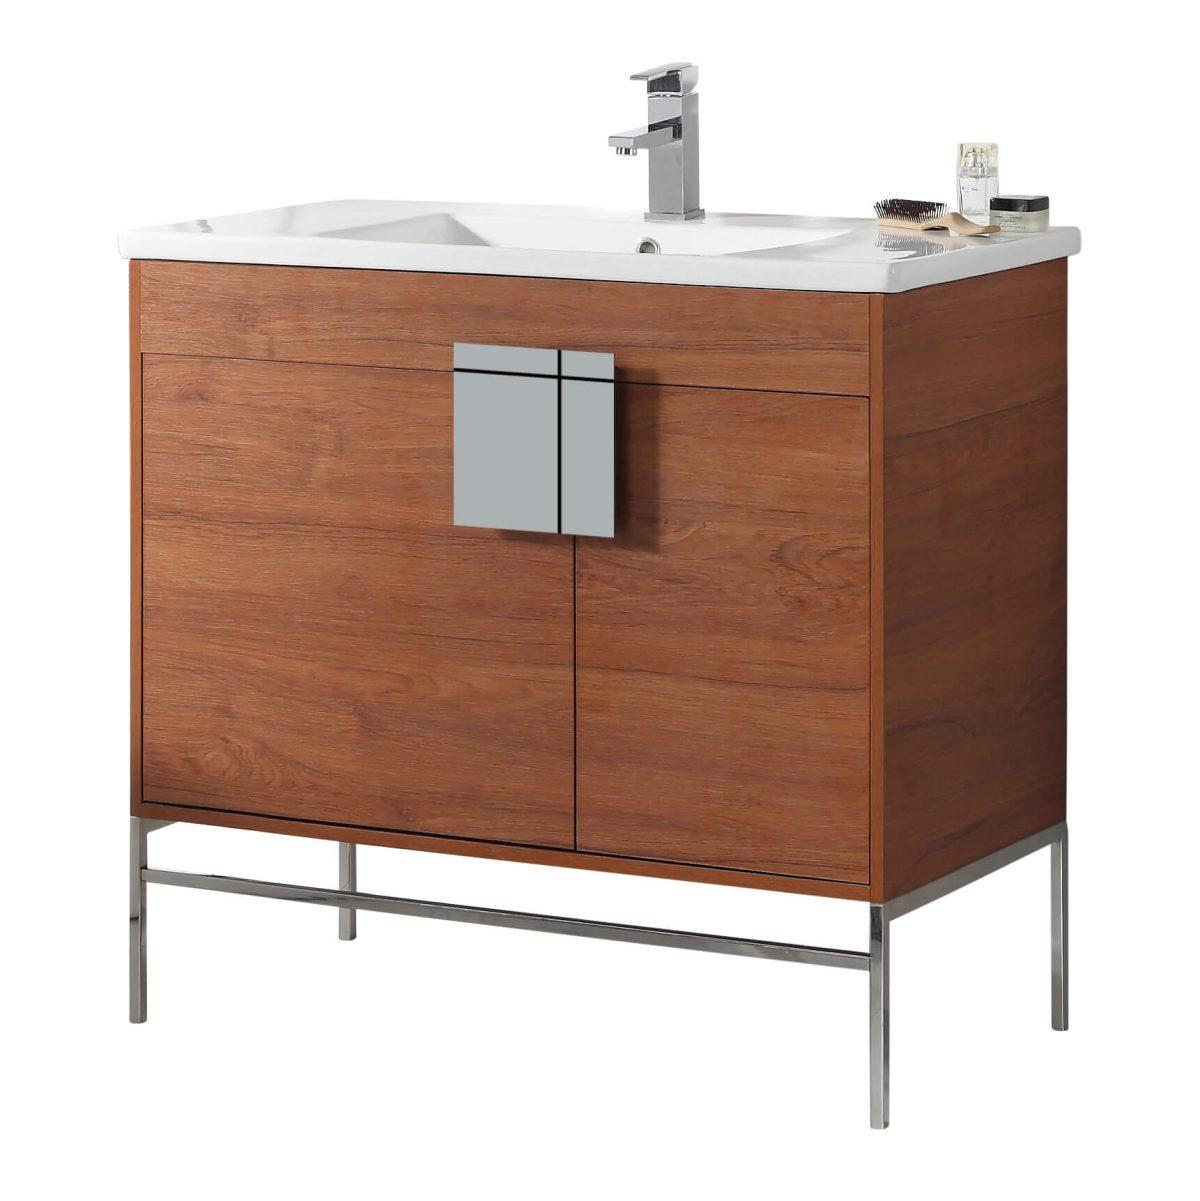 "Shawbridge 36"" Modern Bathroom Vanity  Spicy Walnut with Chrome Hardware"